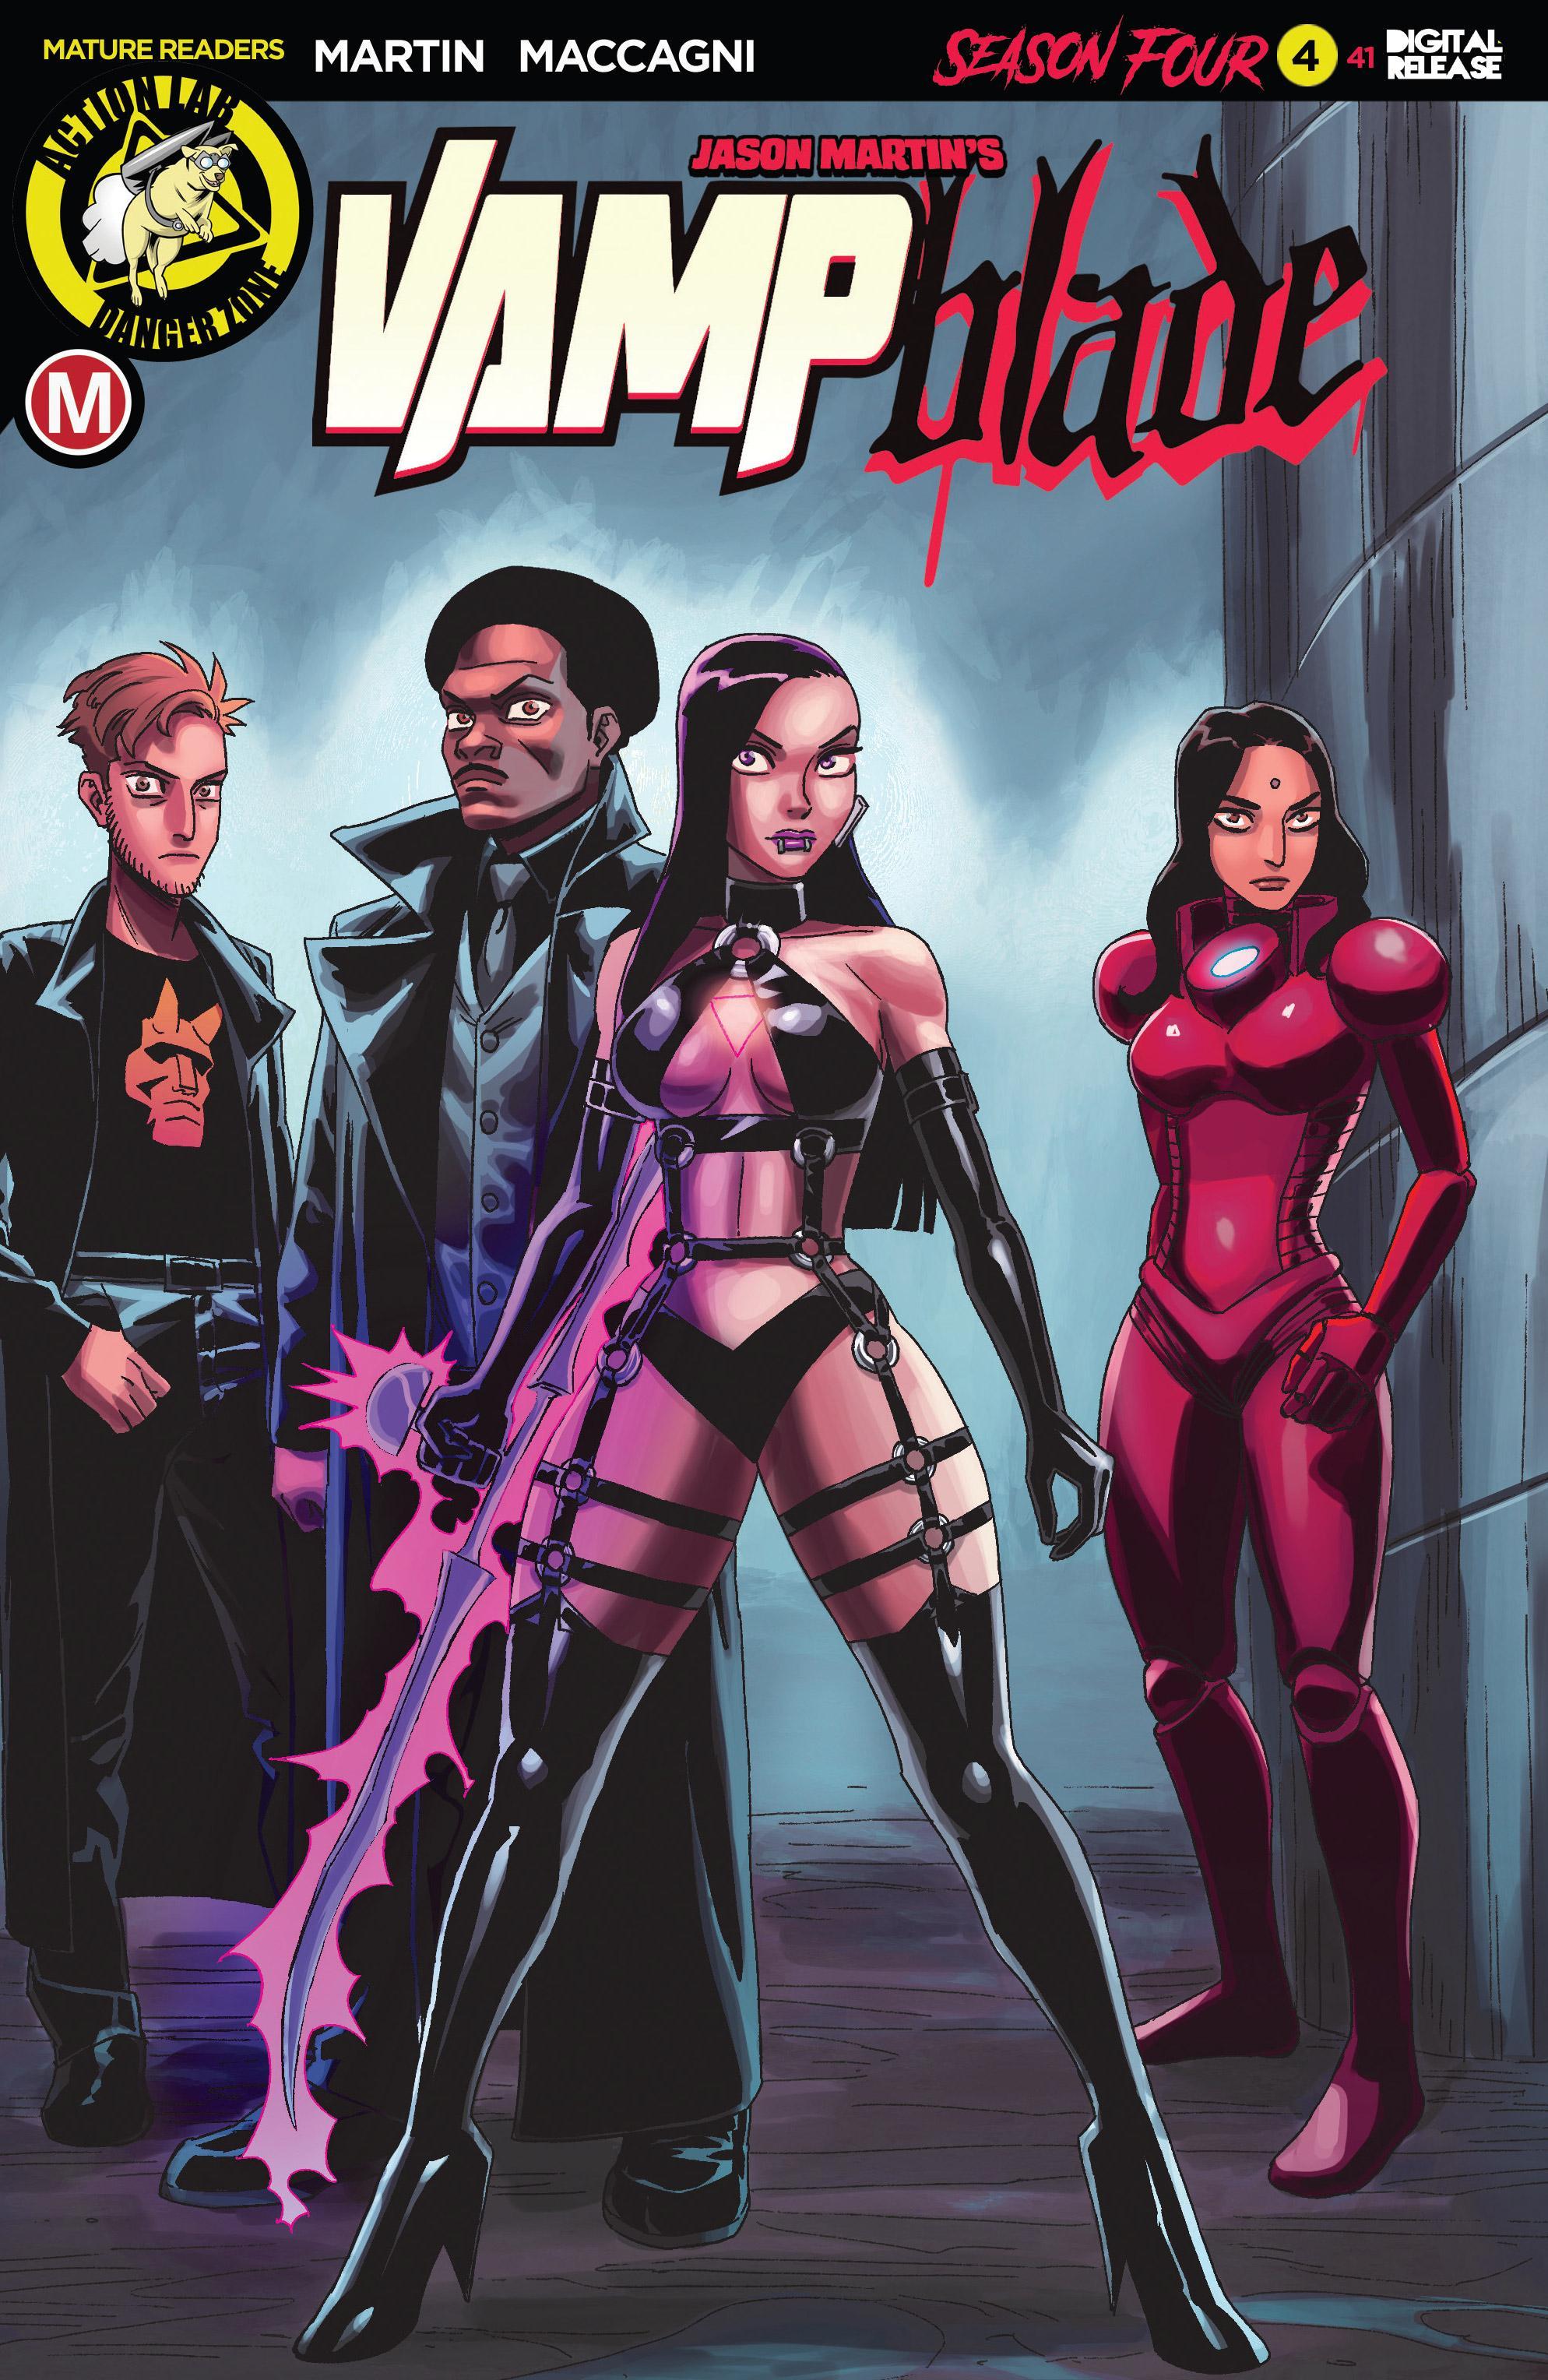 Vampblade Season 4 004 2019 digital dargh